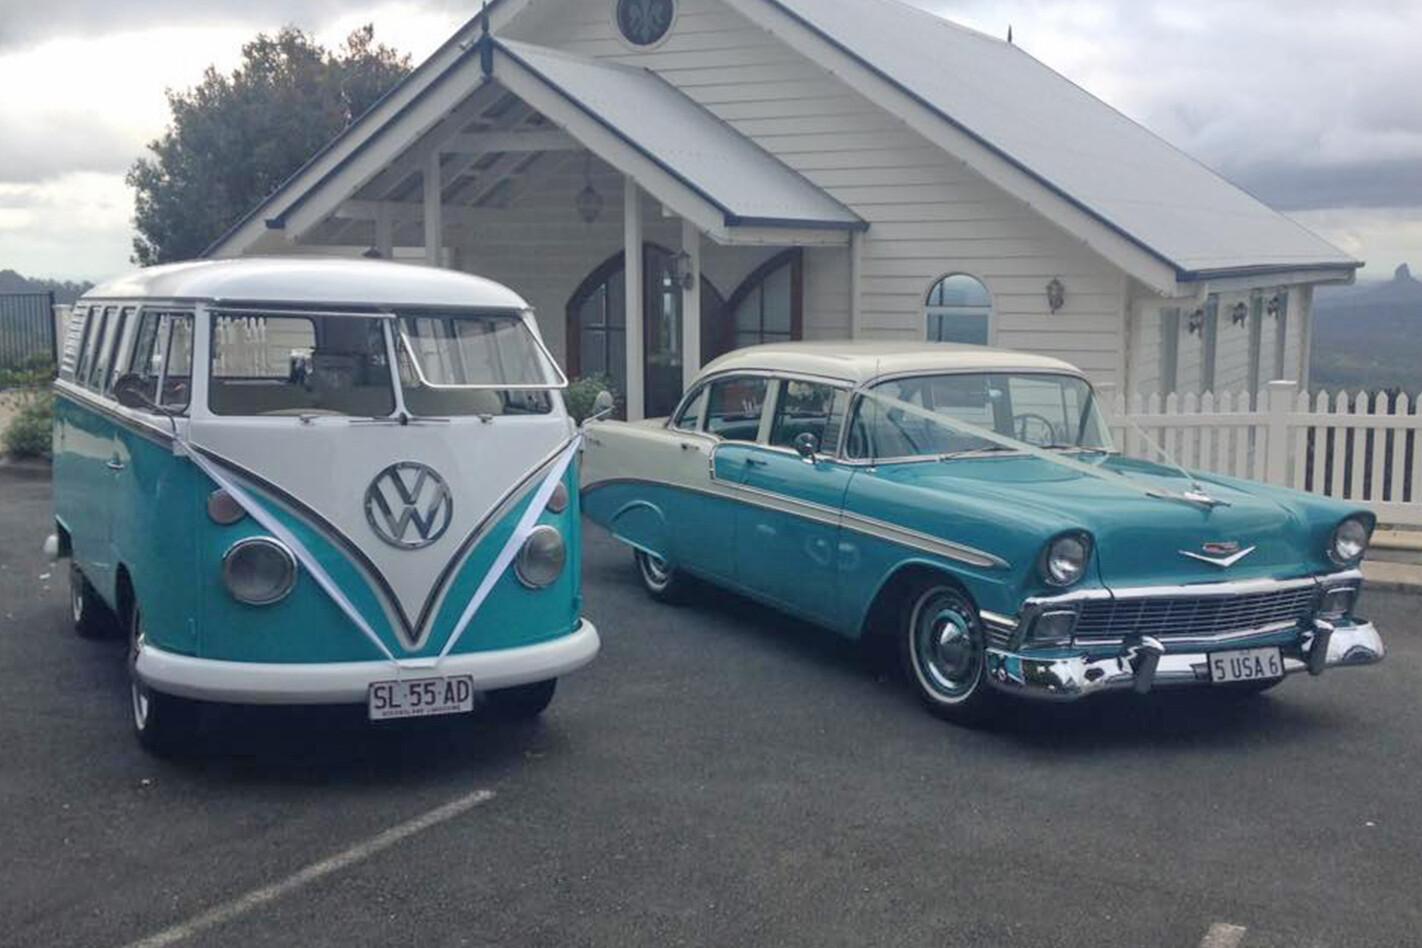 Ross Dunstan's wedding cars